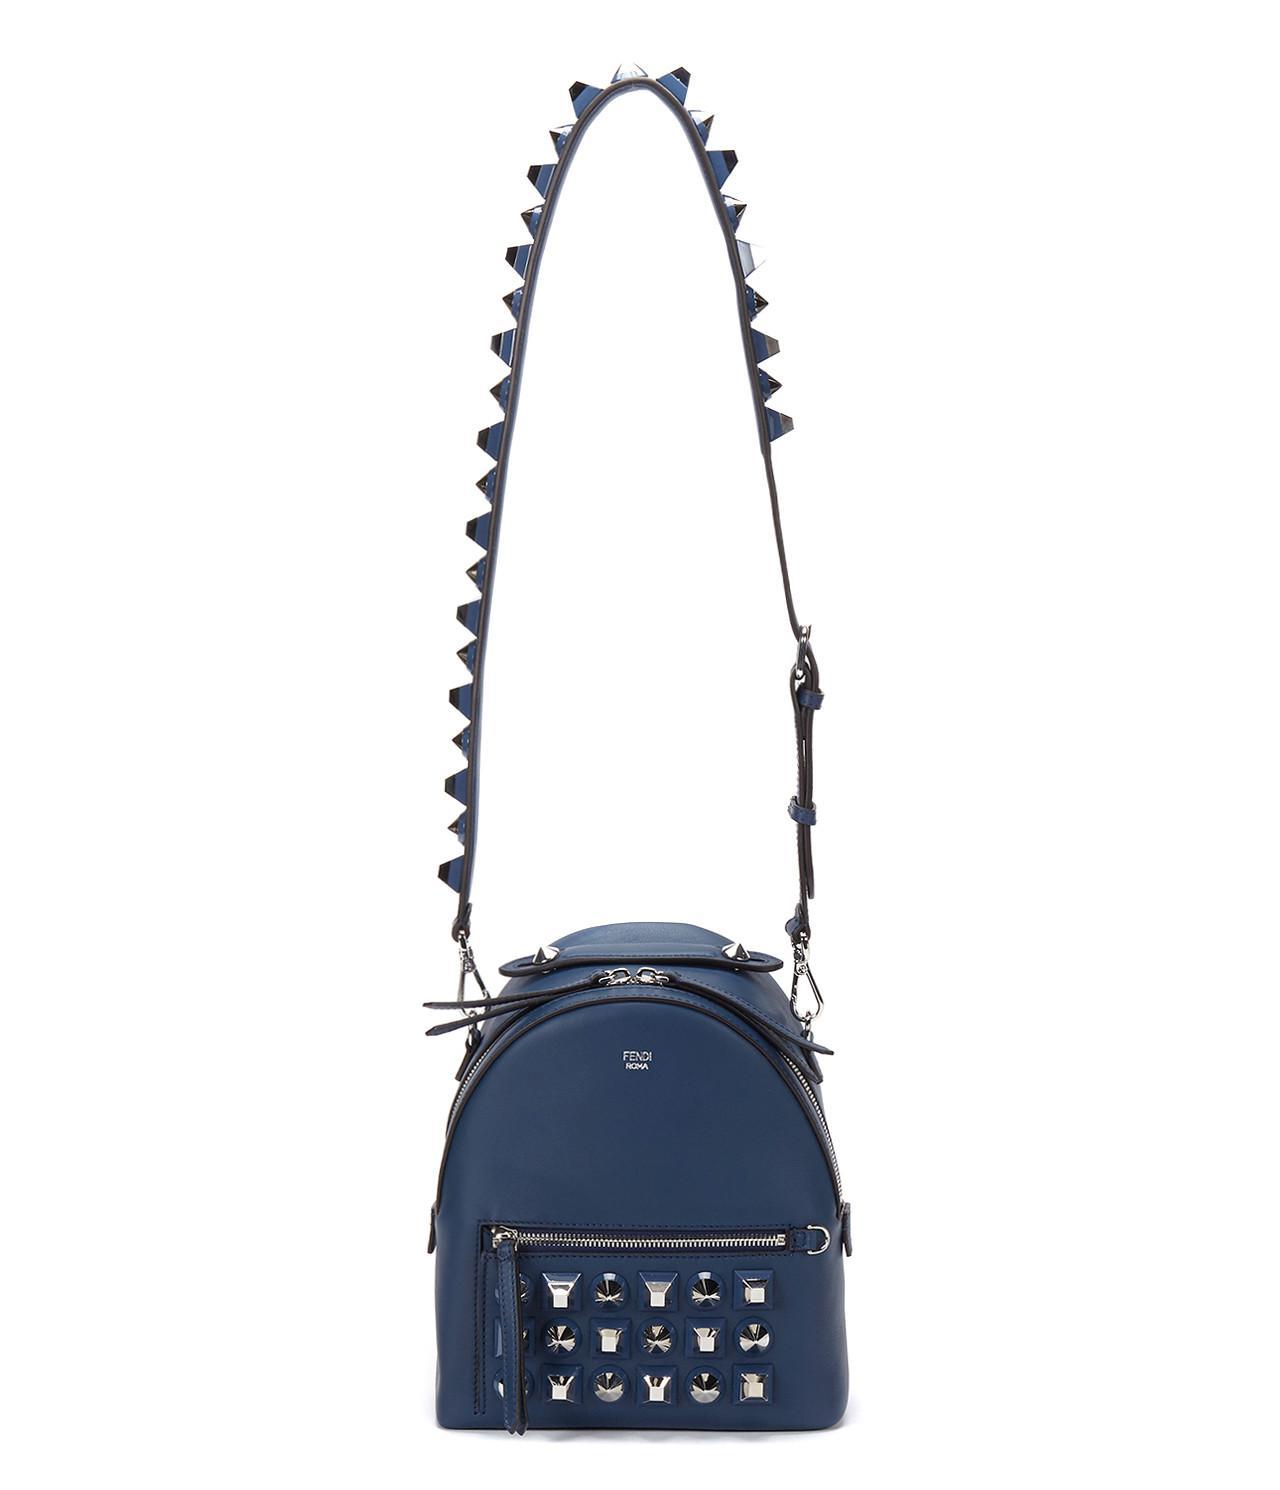 208c9ffdbde2 Fendi 17ss Women s Studded Mini Backpack Blue in Blue - Save 26% - Lyst